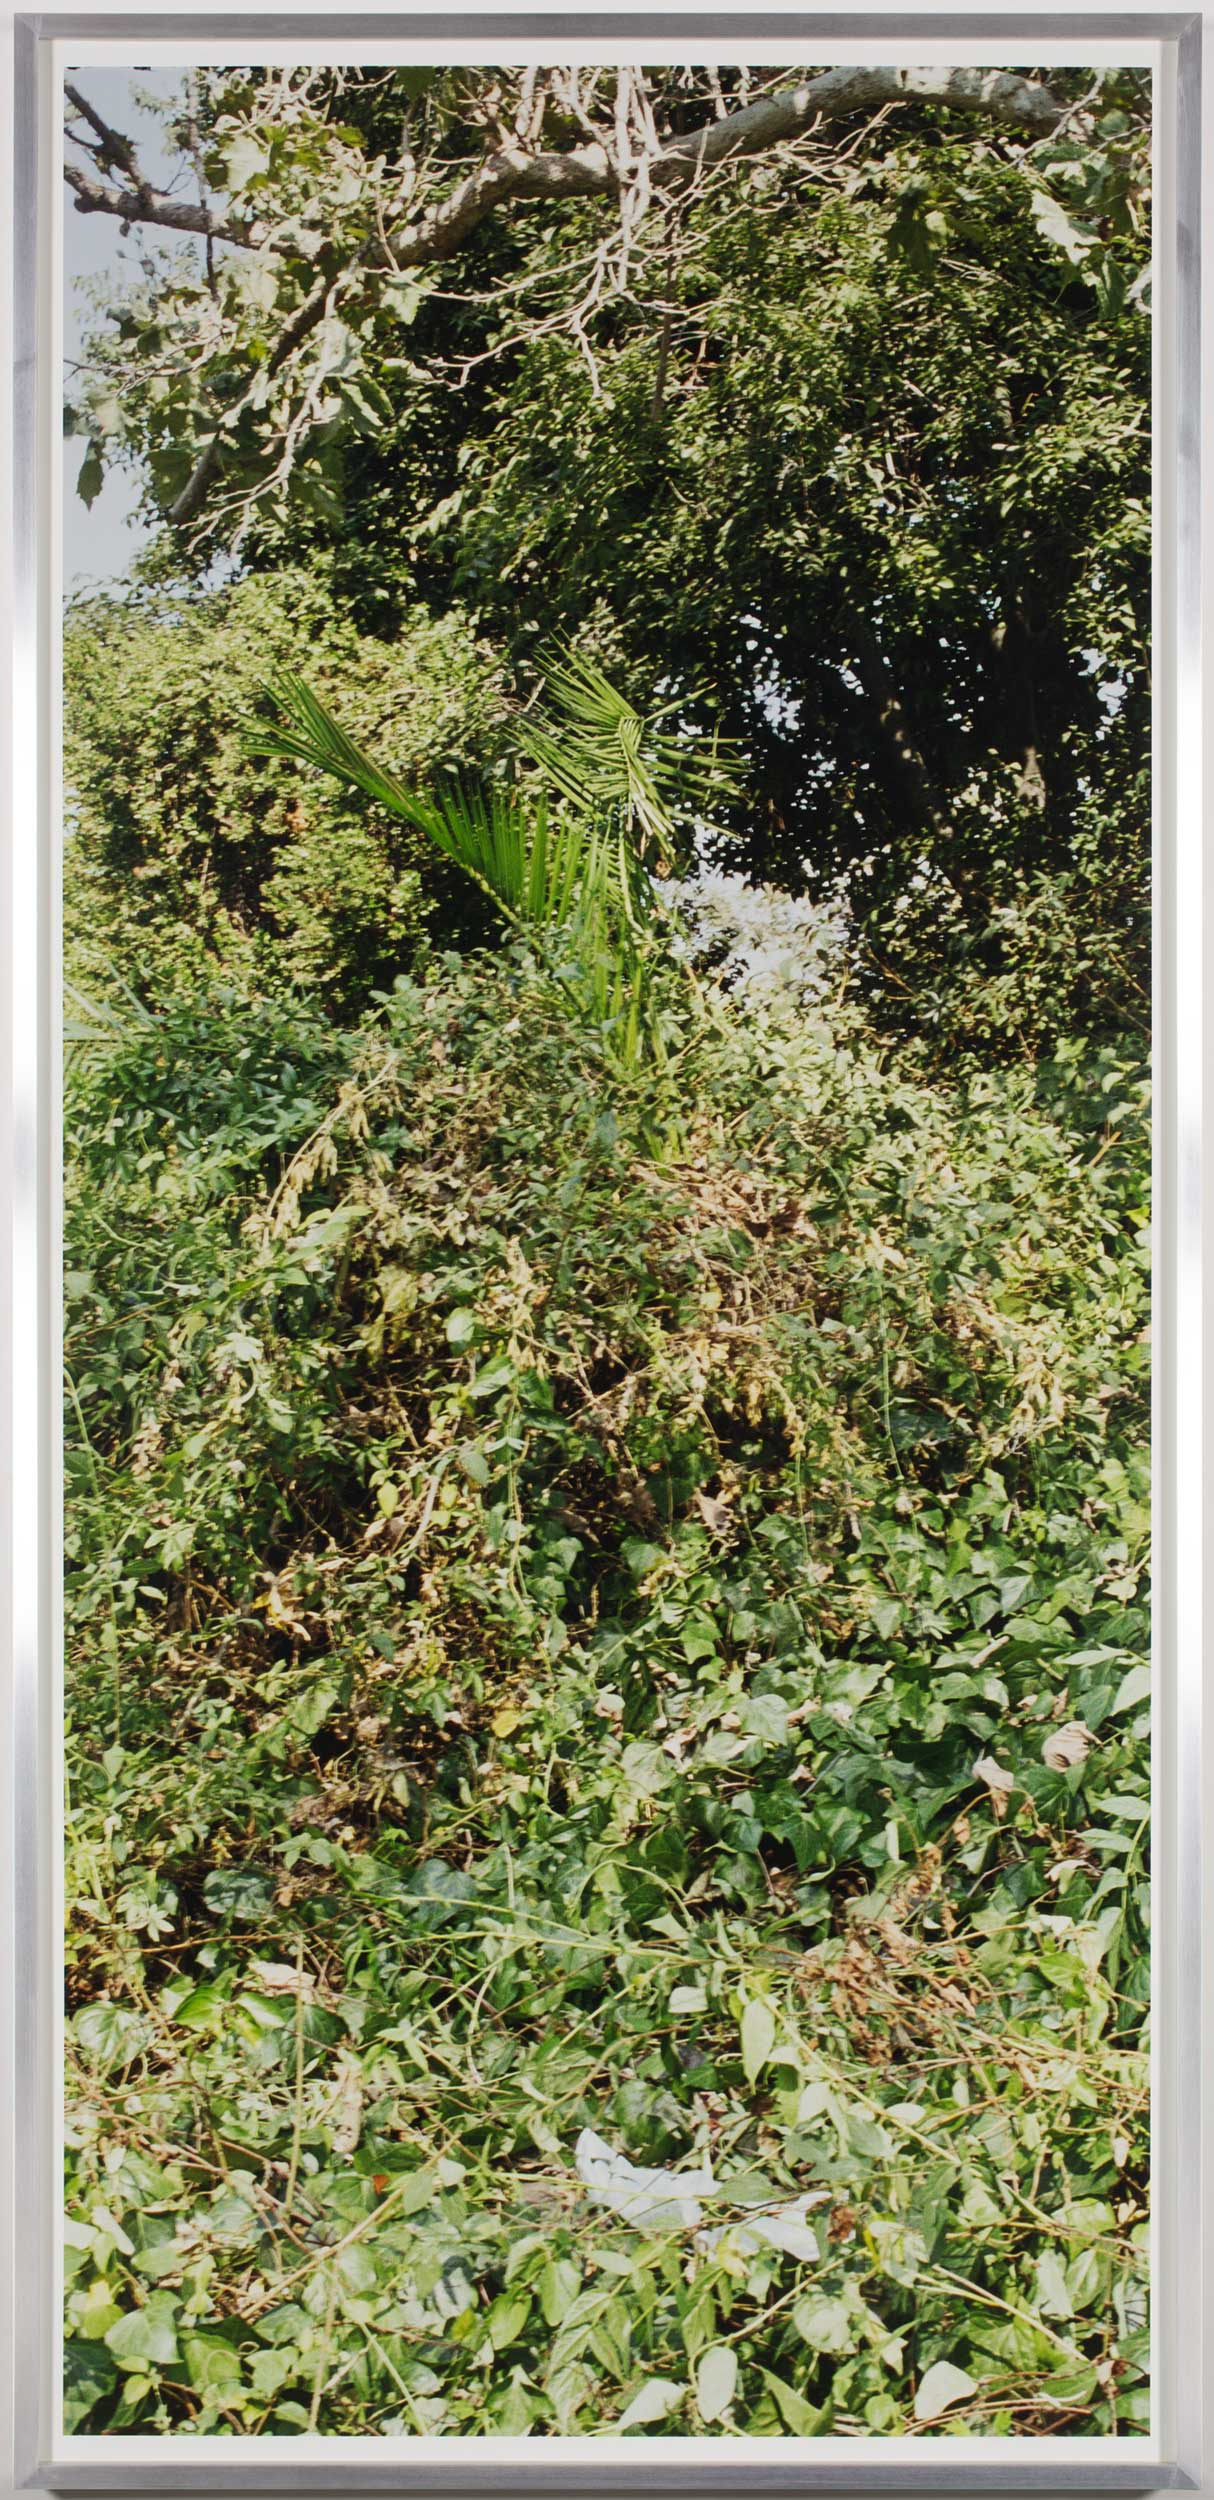 Island Flora #6 (Rte. 101, Southbound)    2005   Chromogenic print  99 1/2 x 47 1/2 inches